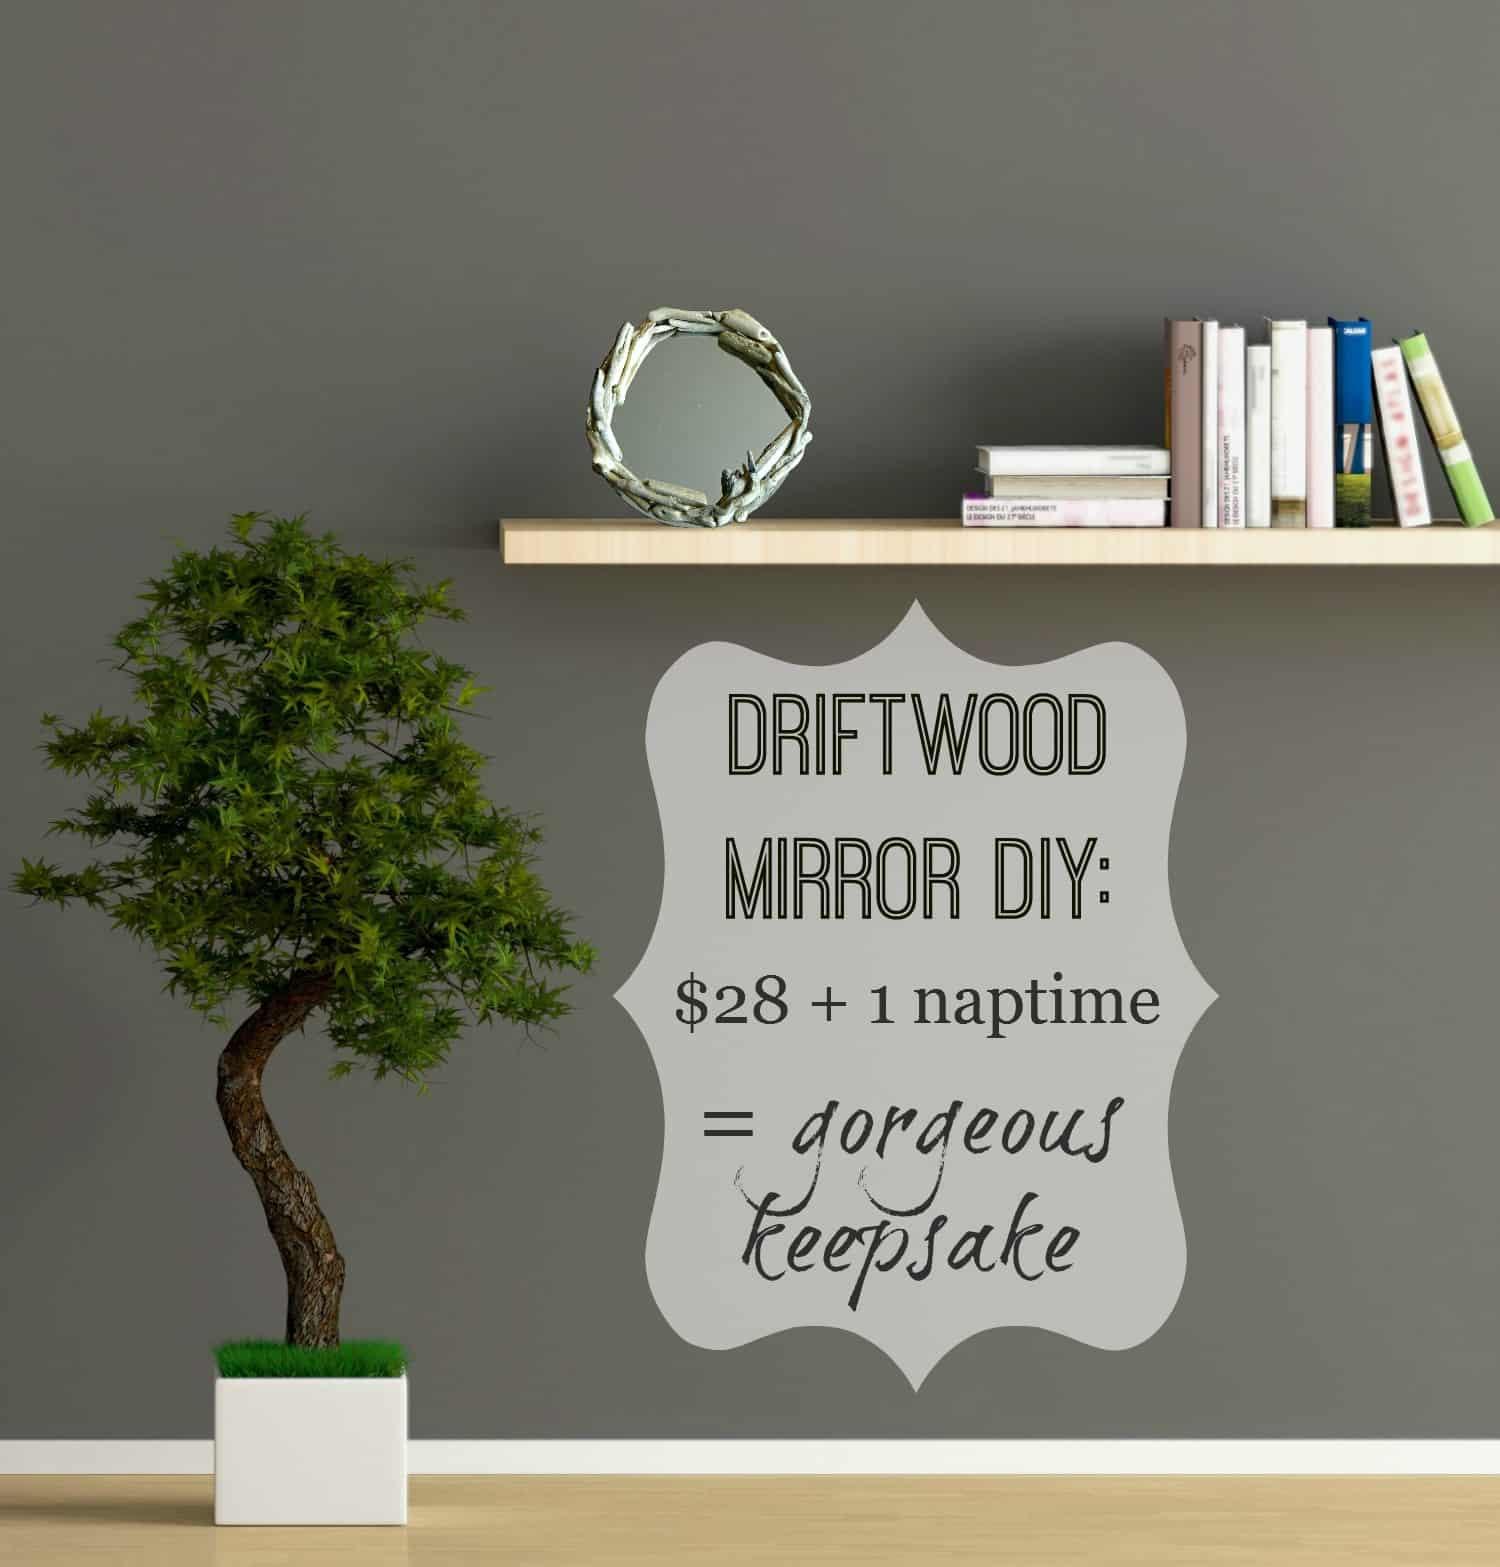 Driftwoodmirrordiykitgrayroombookshelflabel